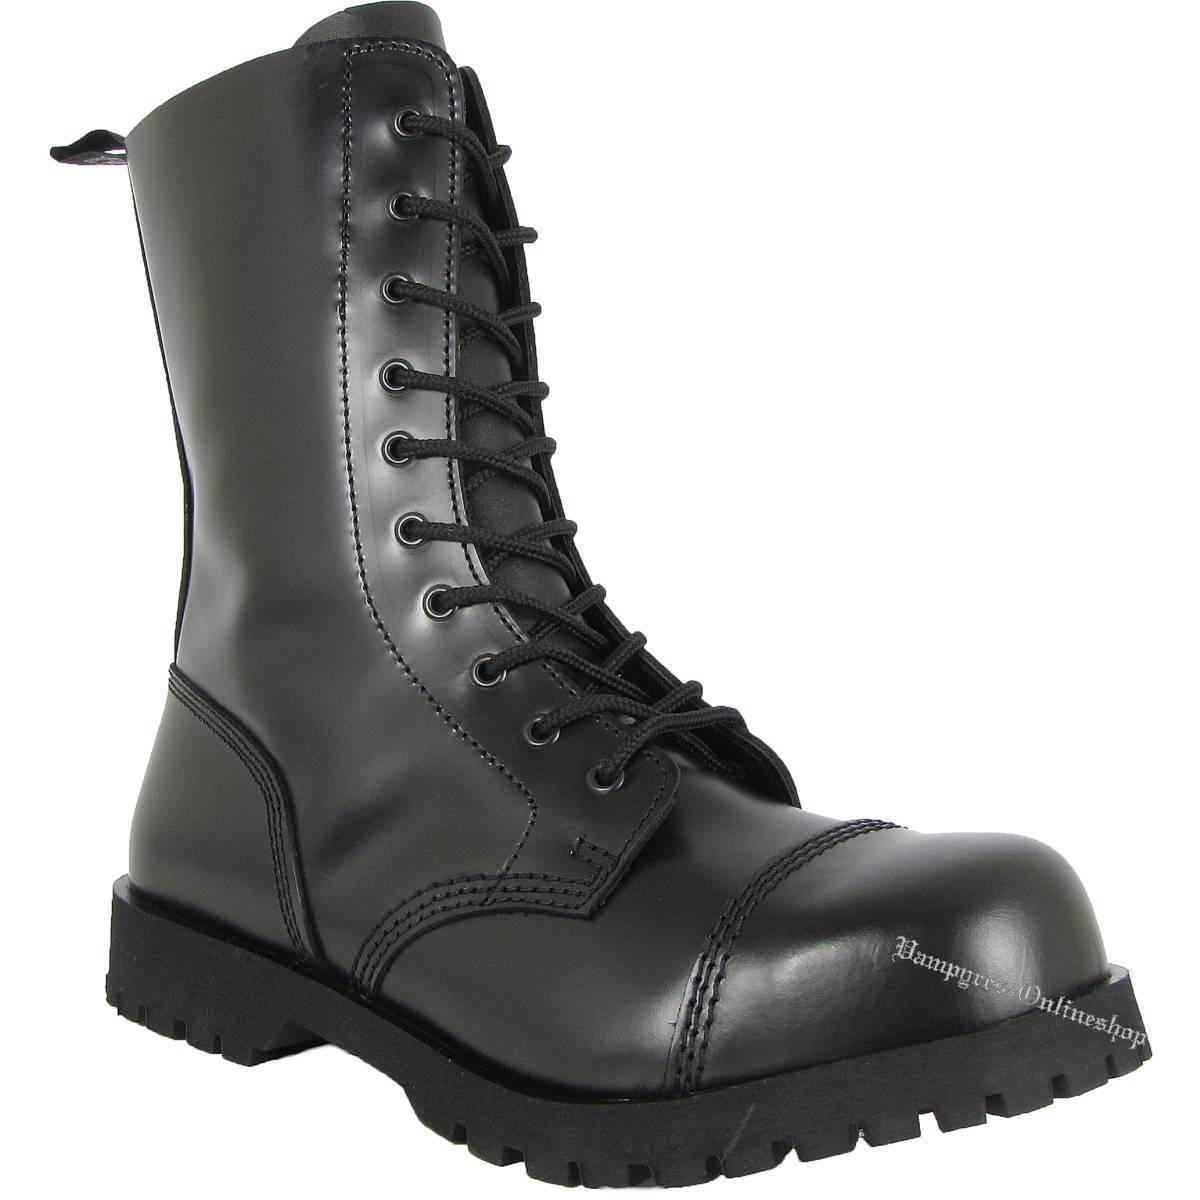 Boots & Braces botas 10 agujeros negro and cuero rangers acero tapas Noir Black